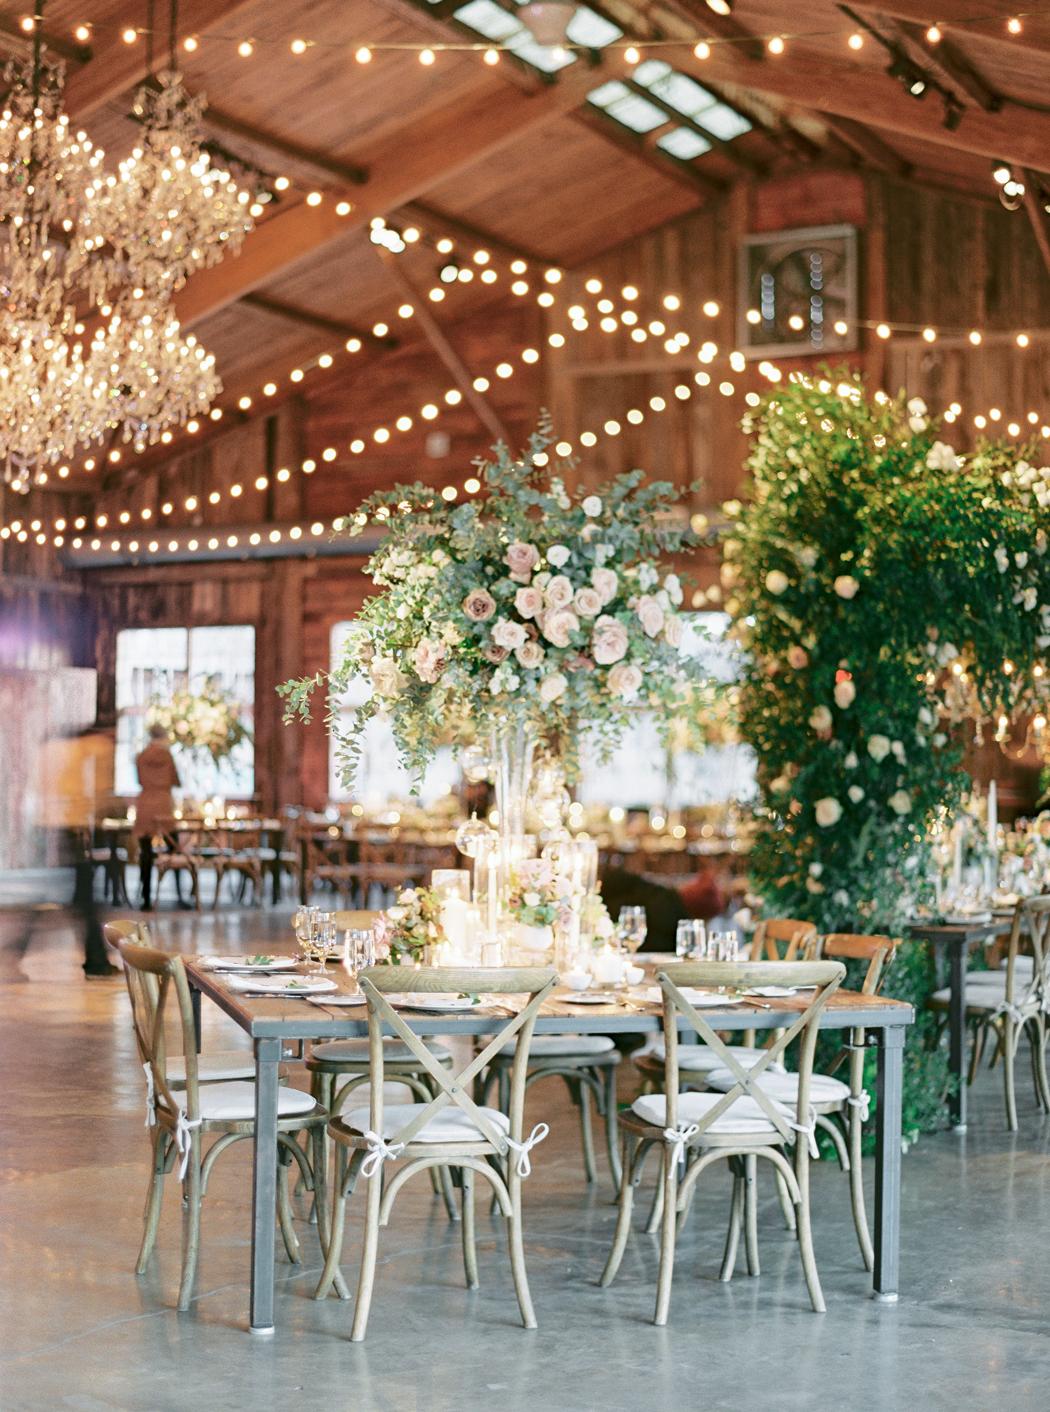 barn reception space hanging string lights